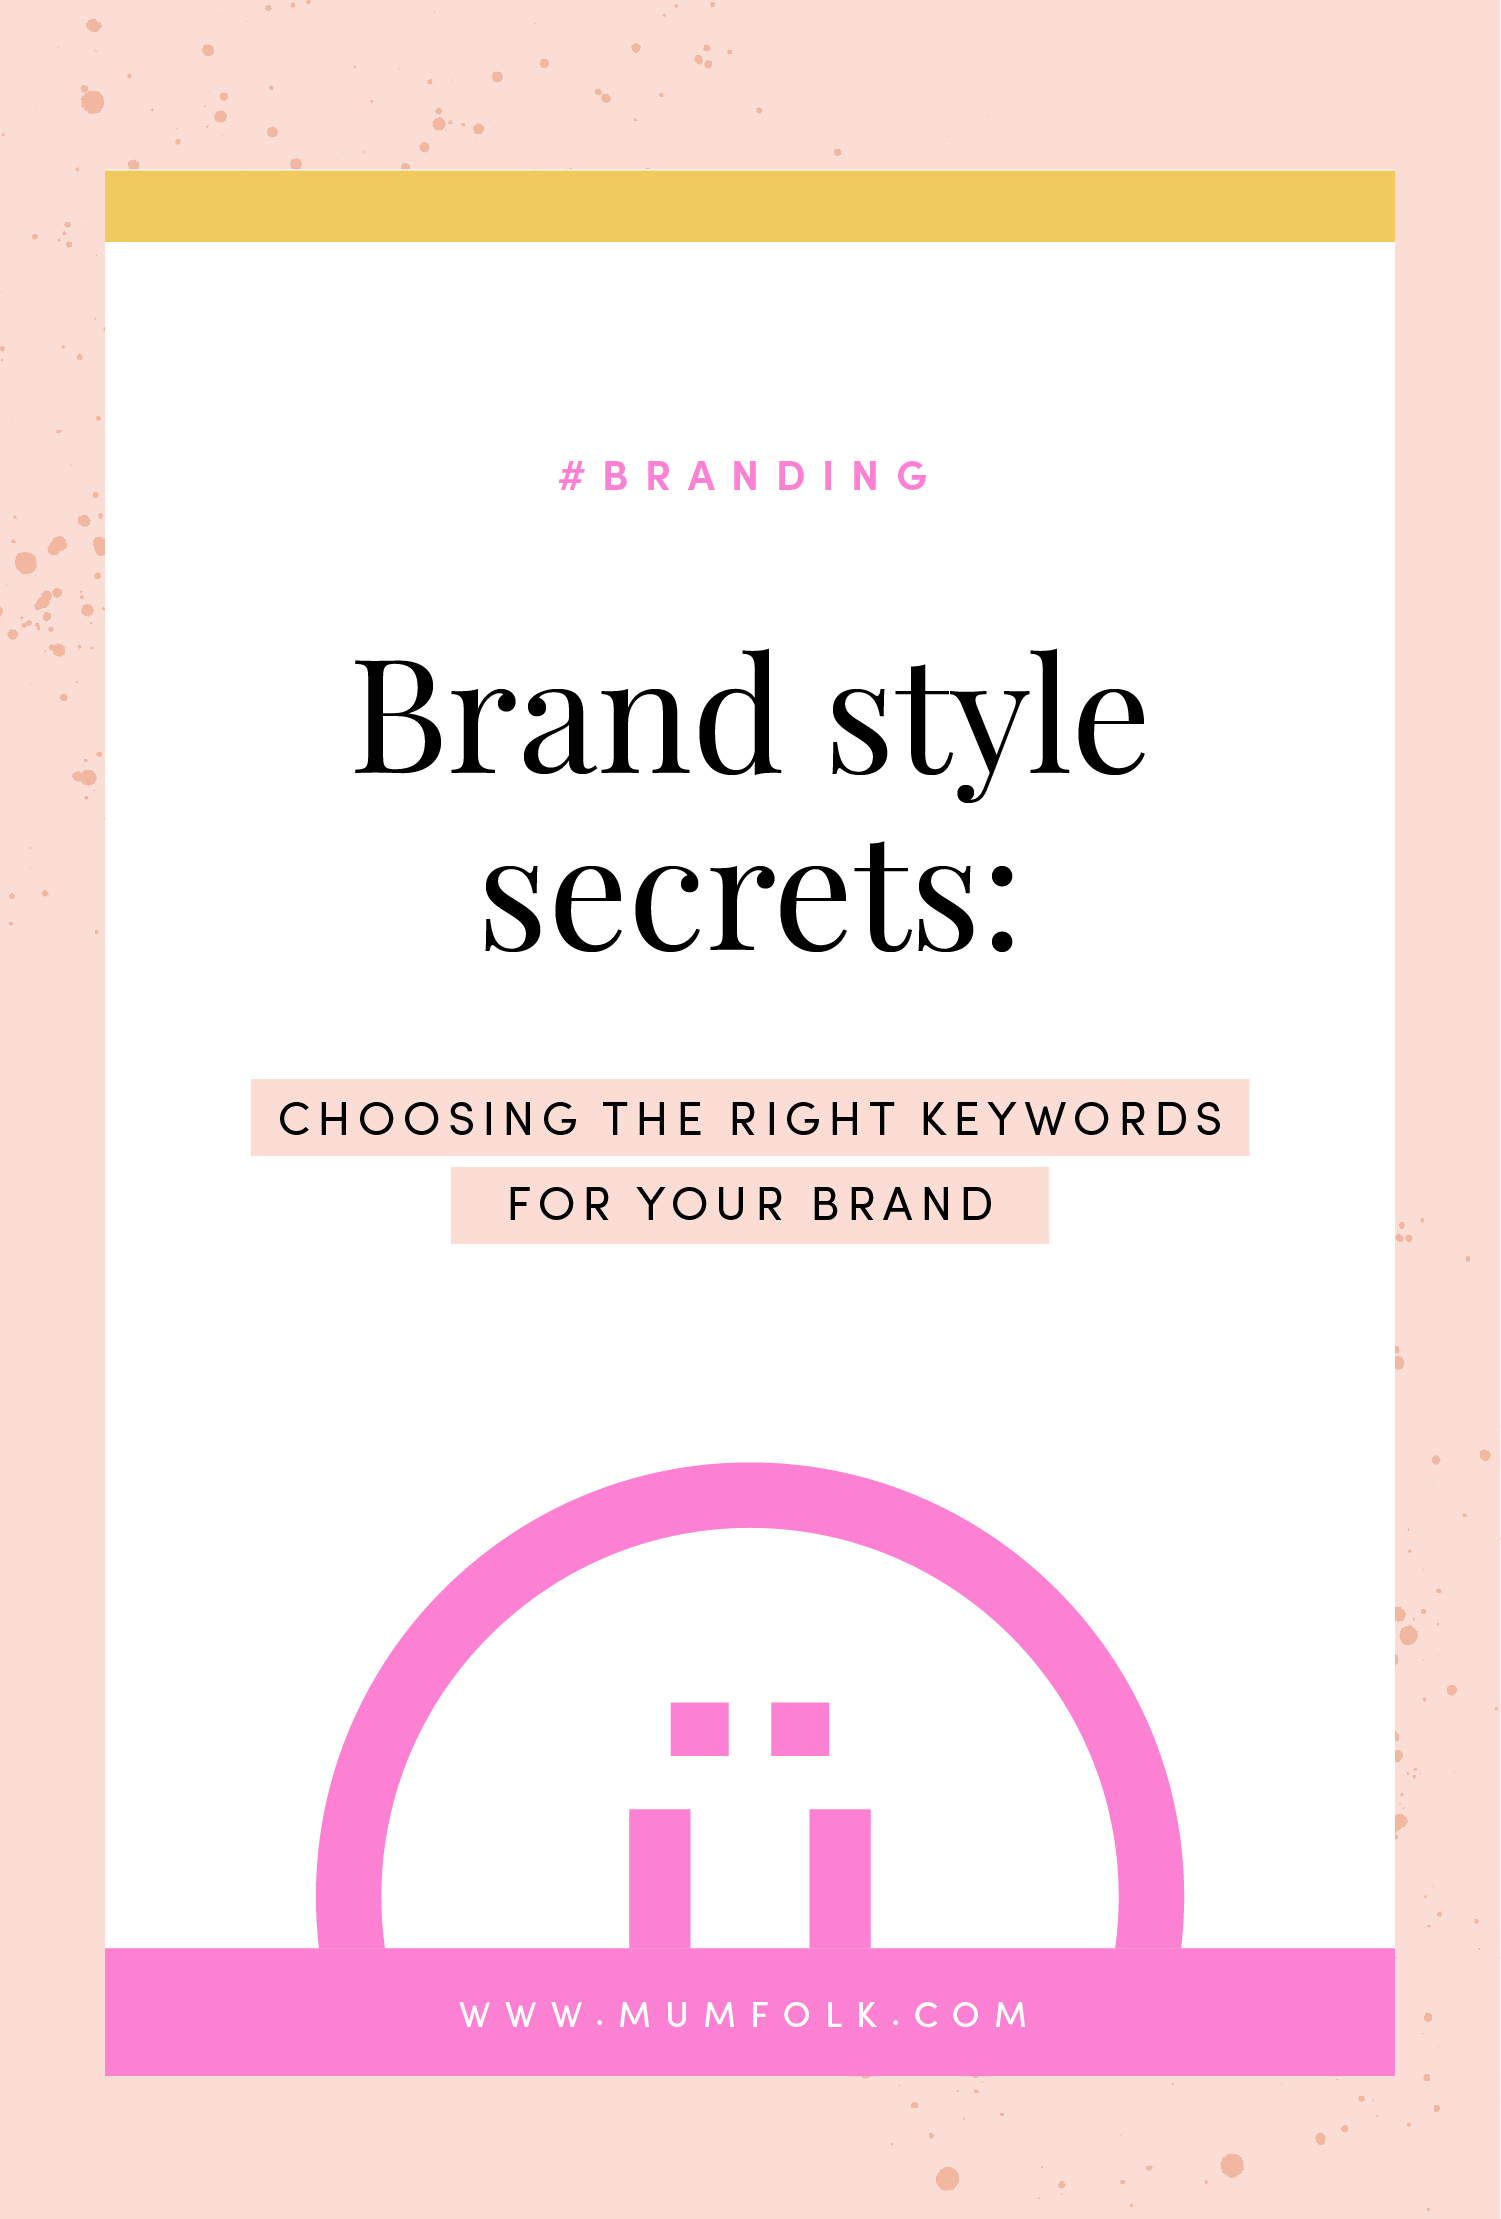 Brand style secrets_choosing right keywords.jpg